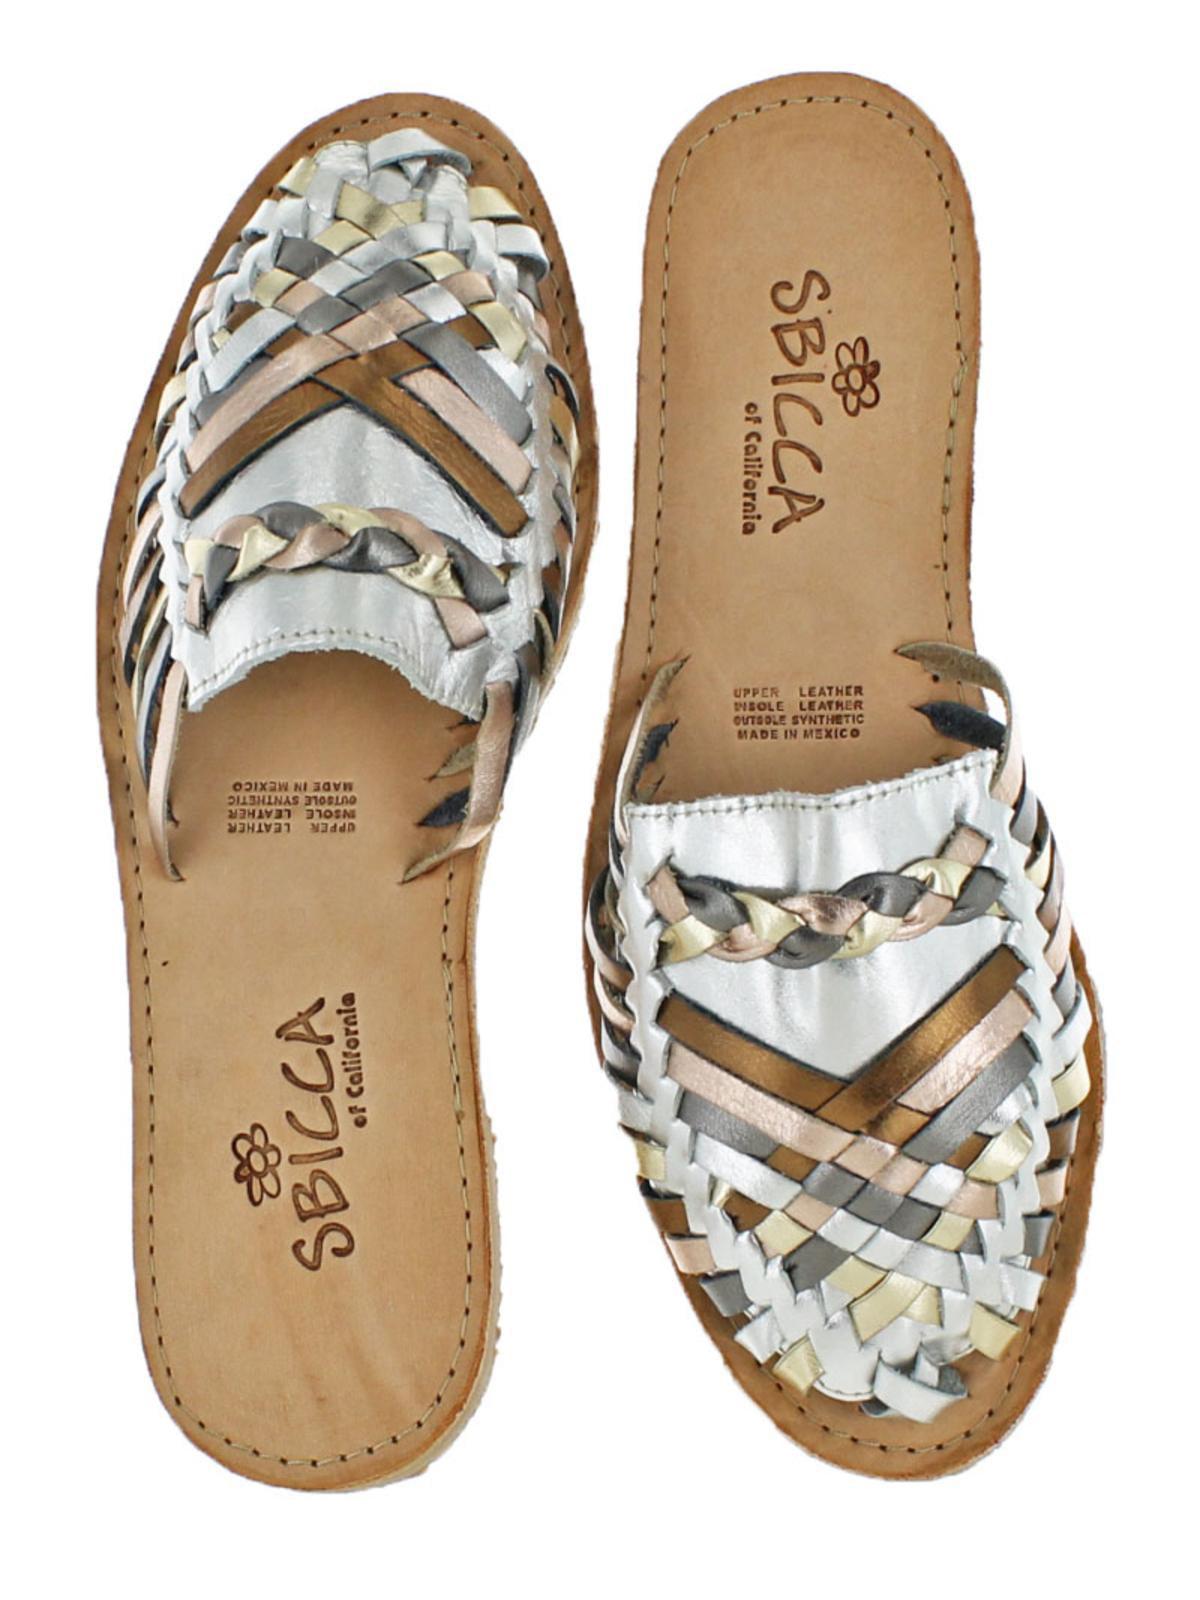 64404ead3a1c Sbicca - Sbicca Womens Baines Closed Toe Vintage Huarache Sandals -  Walmart.com